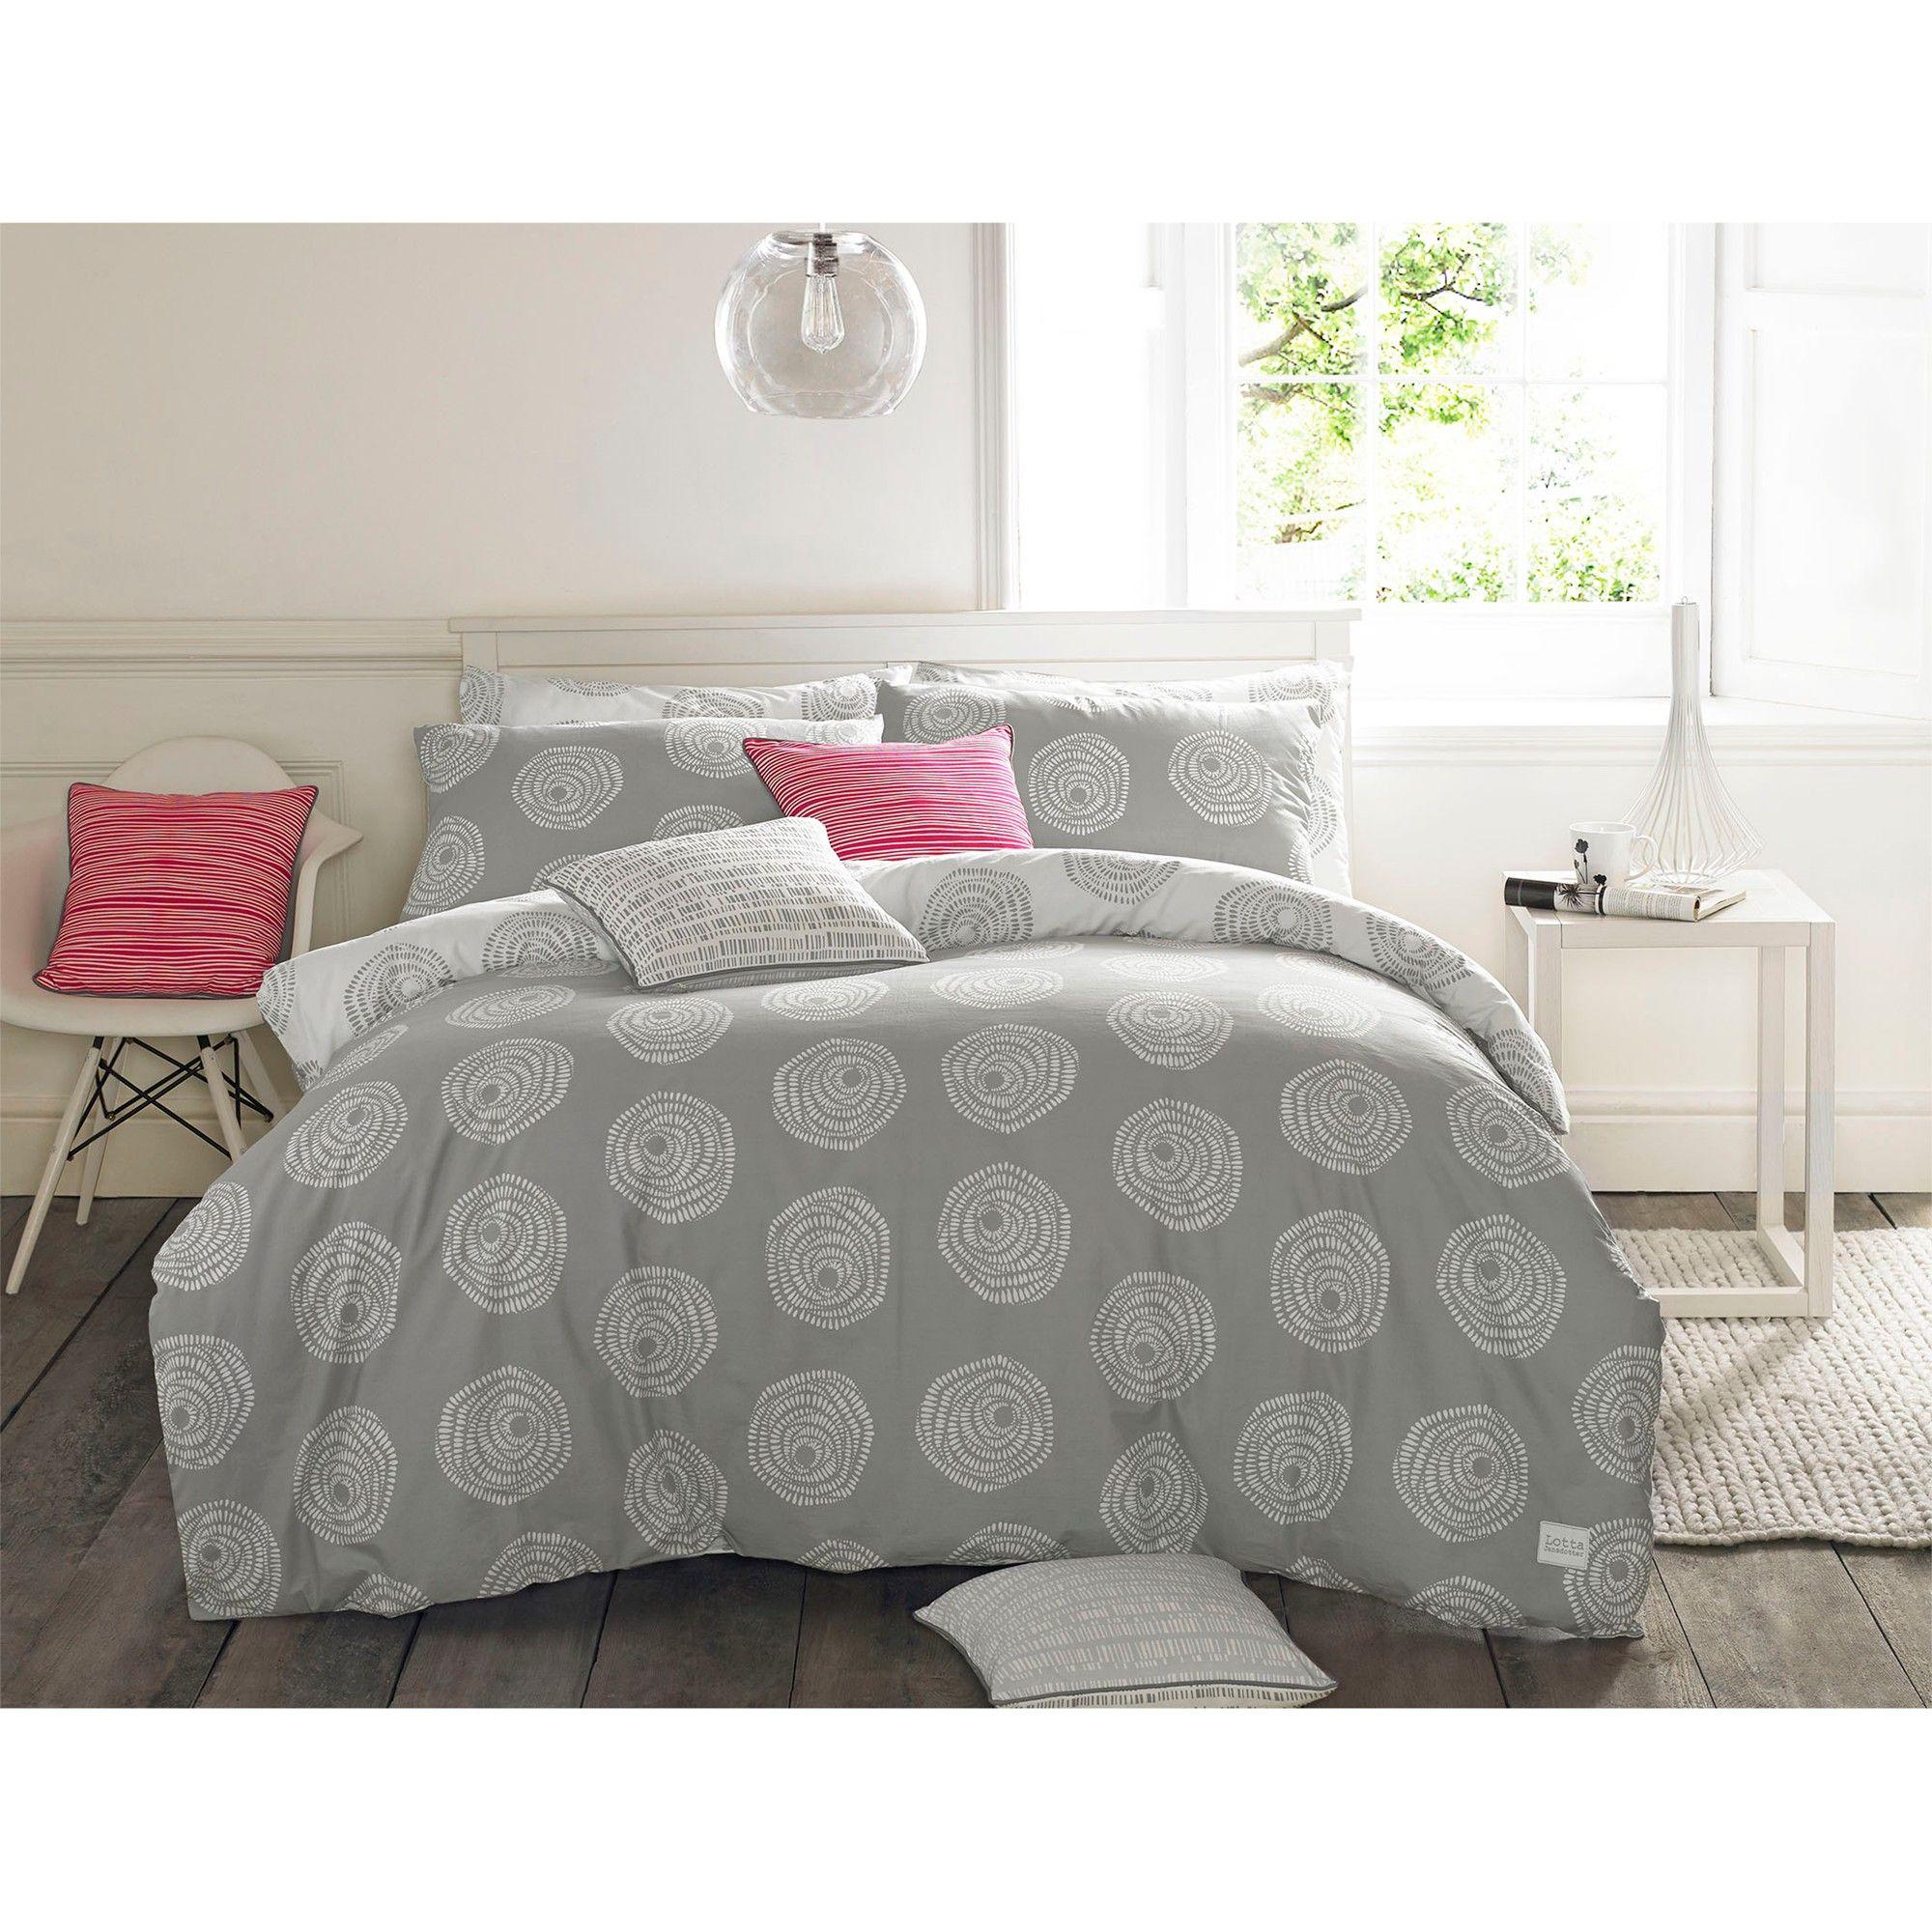 duvet reviews ebern metallic cover pdx comforter bath designs set wayfair eichelberger bed